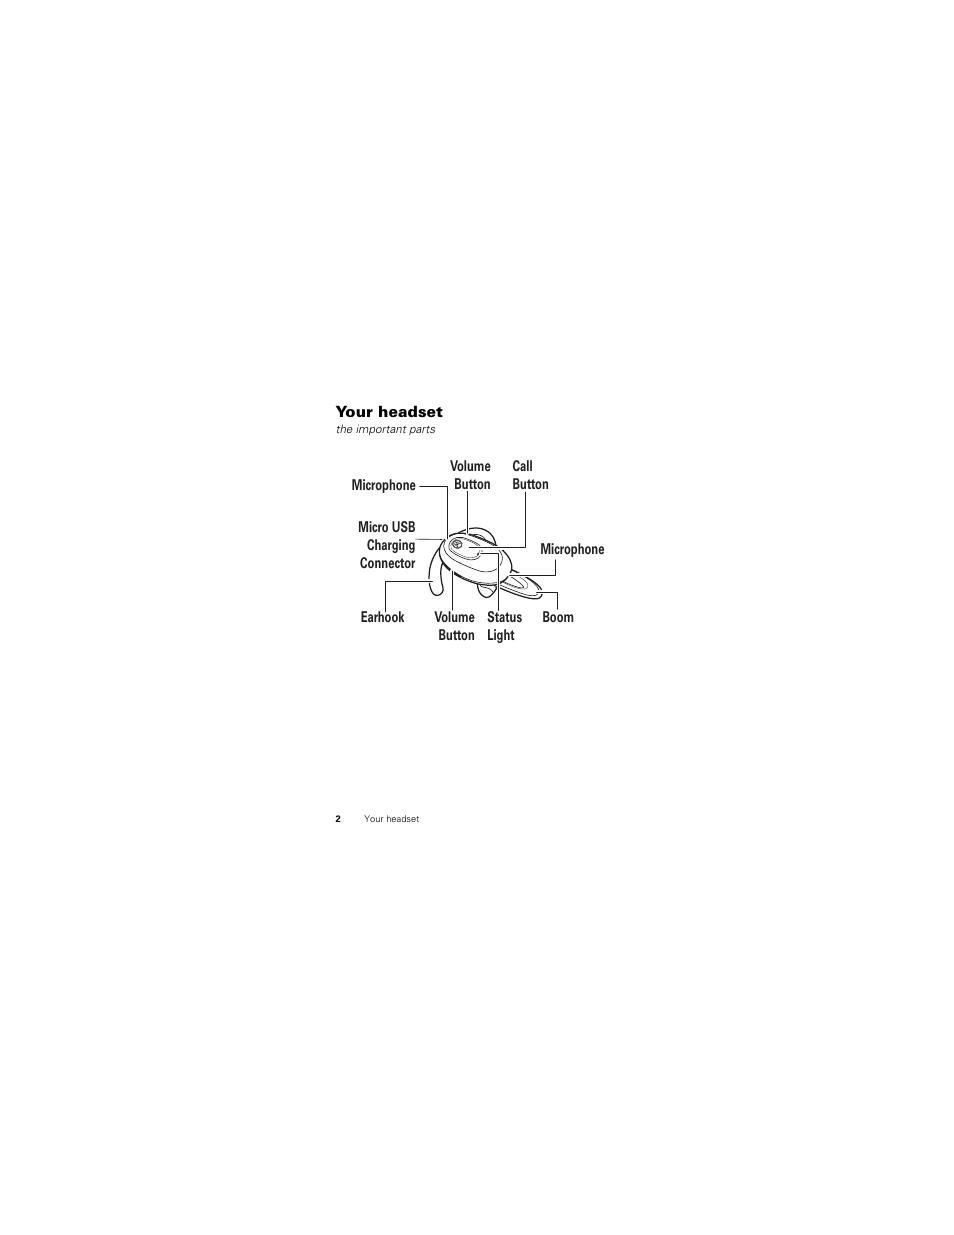 your headset motorola h730 user manual page 4 106 rh manualsdir com